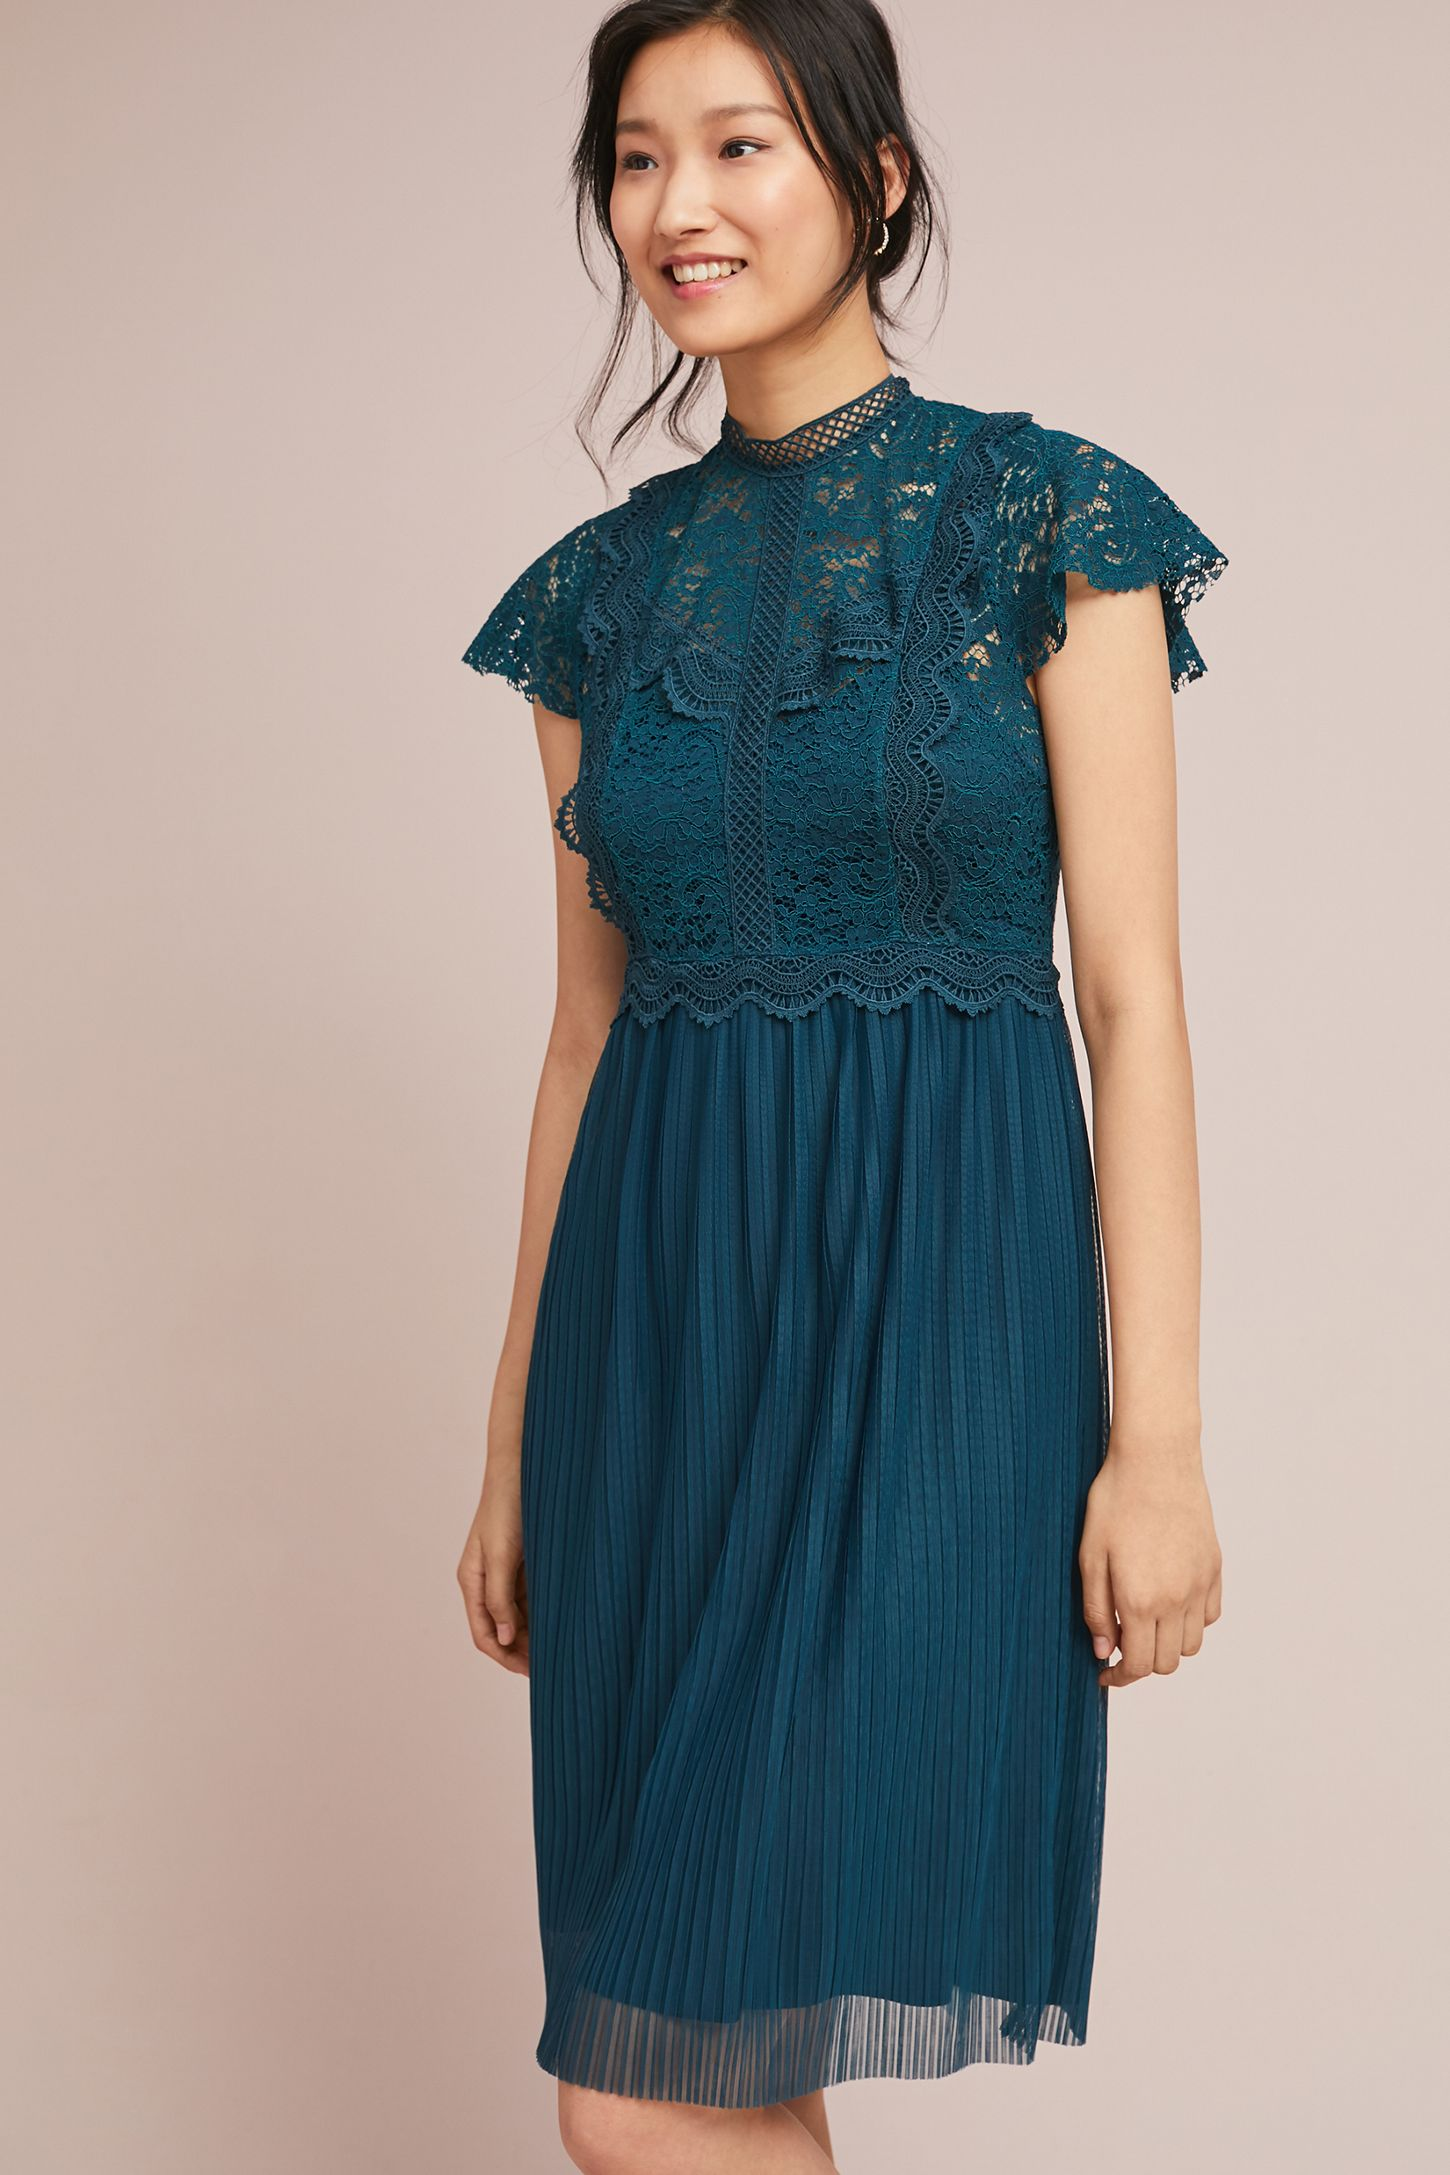 6341fcfcf21da Greenwich Lace Dress | Anthropologie